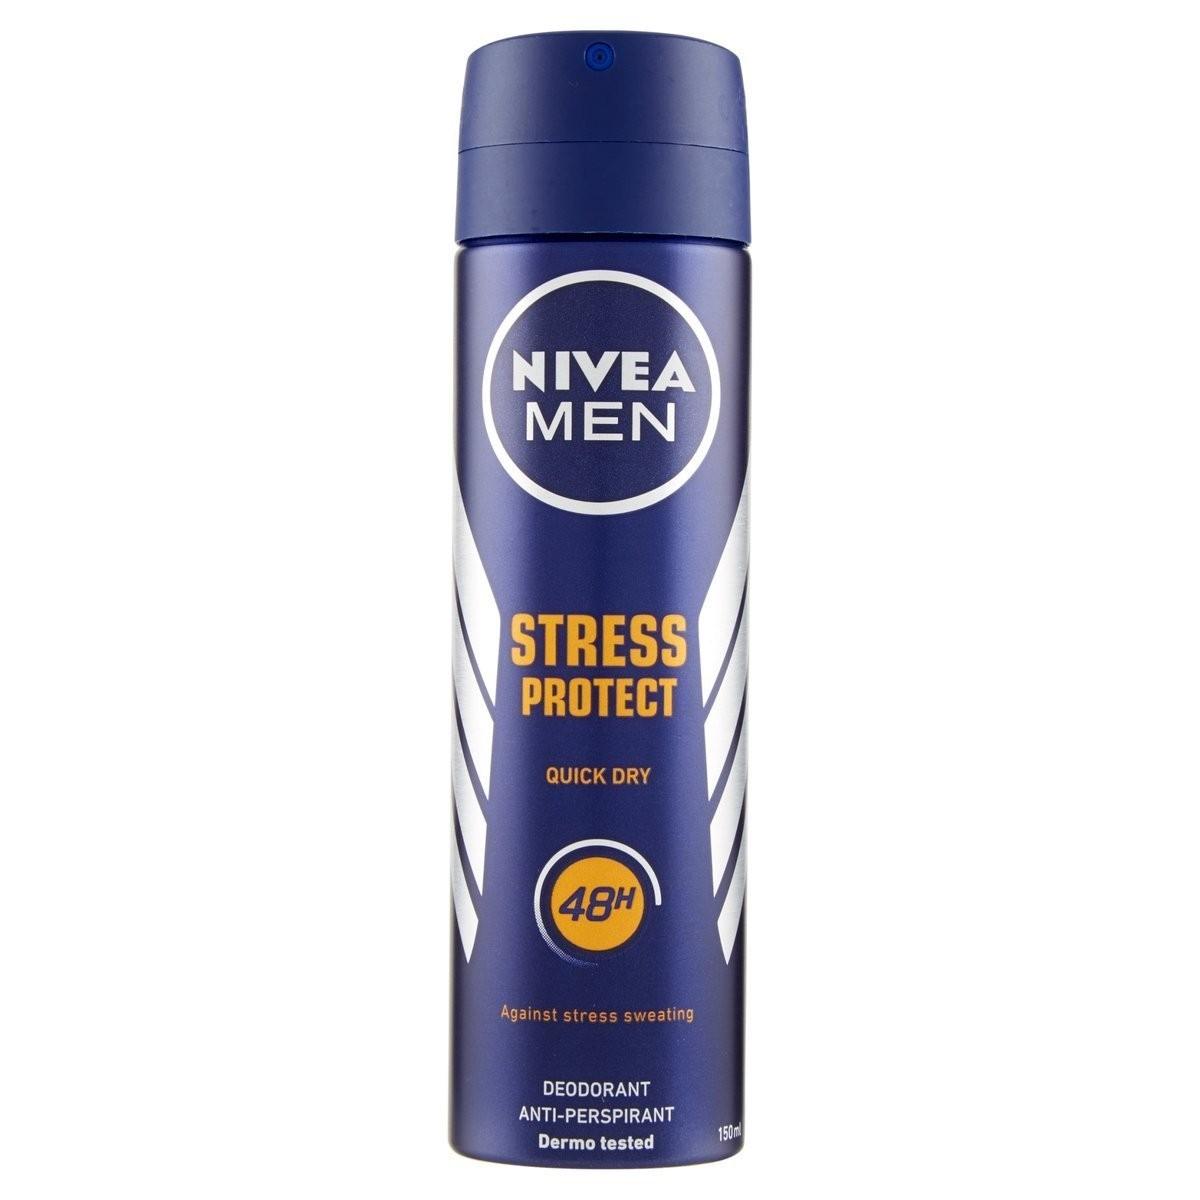 Nivea Men Deodorante spray Stress Protect